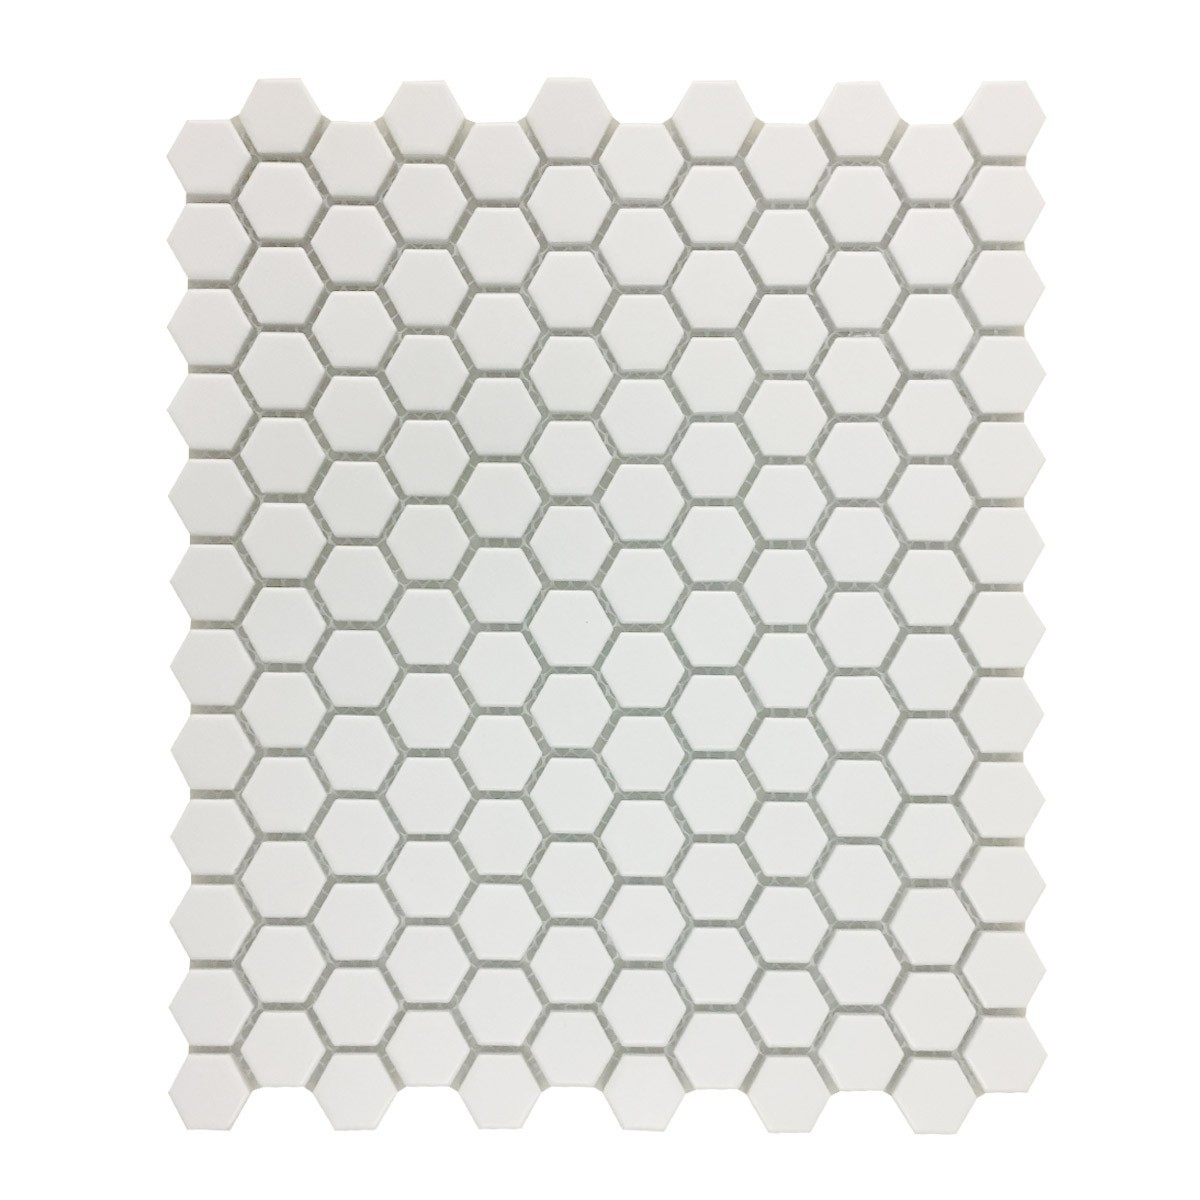 "White Matte Porcelain Mosaic Hexagon Floor Wall Tile 1 Tile Sheet 10.25"" x 11.8"""